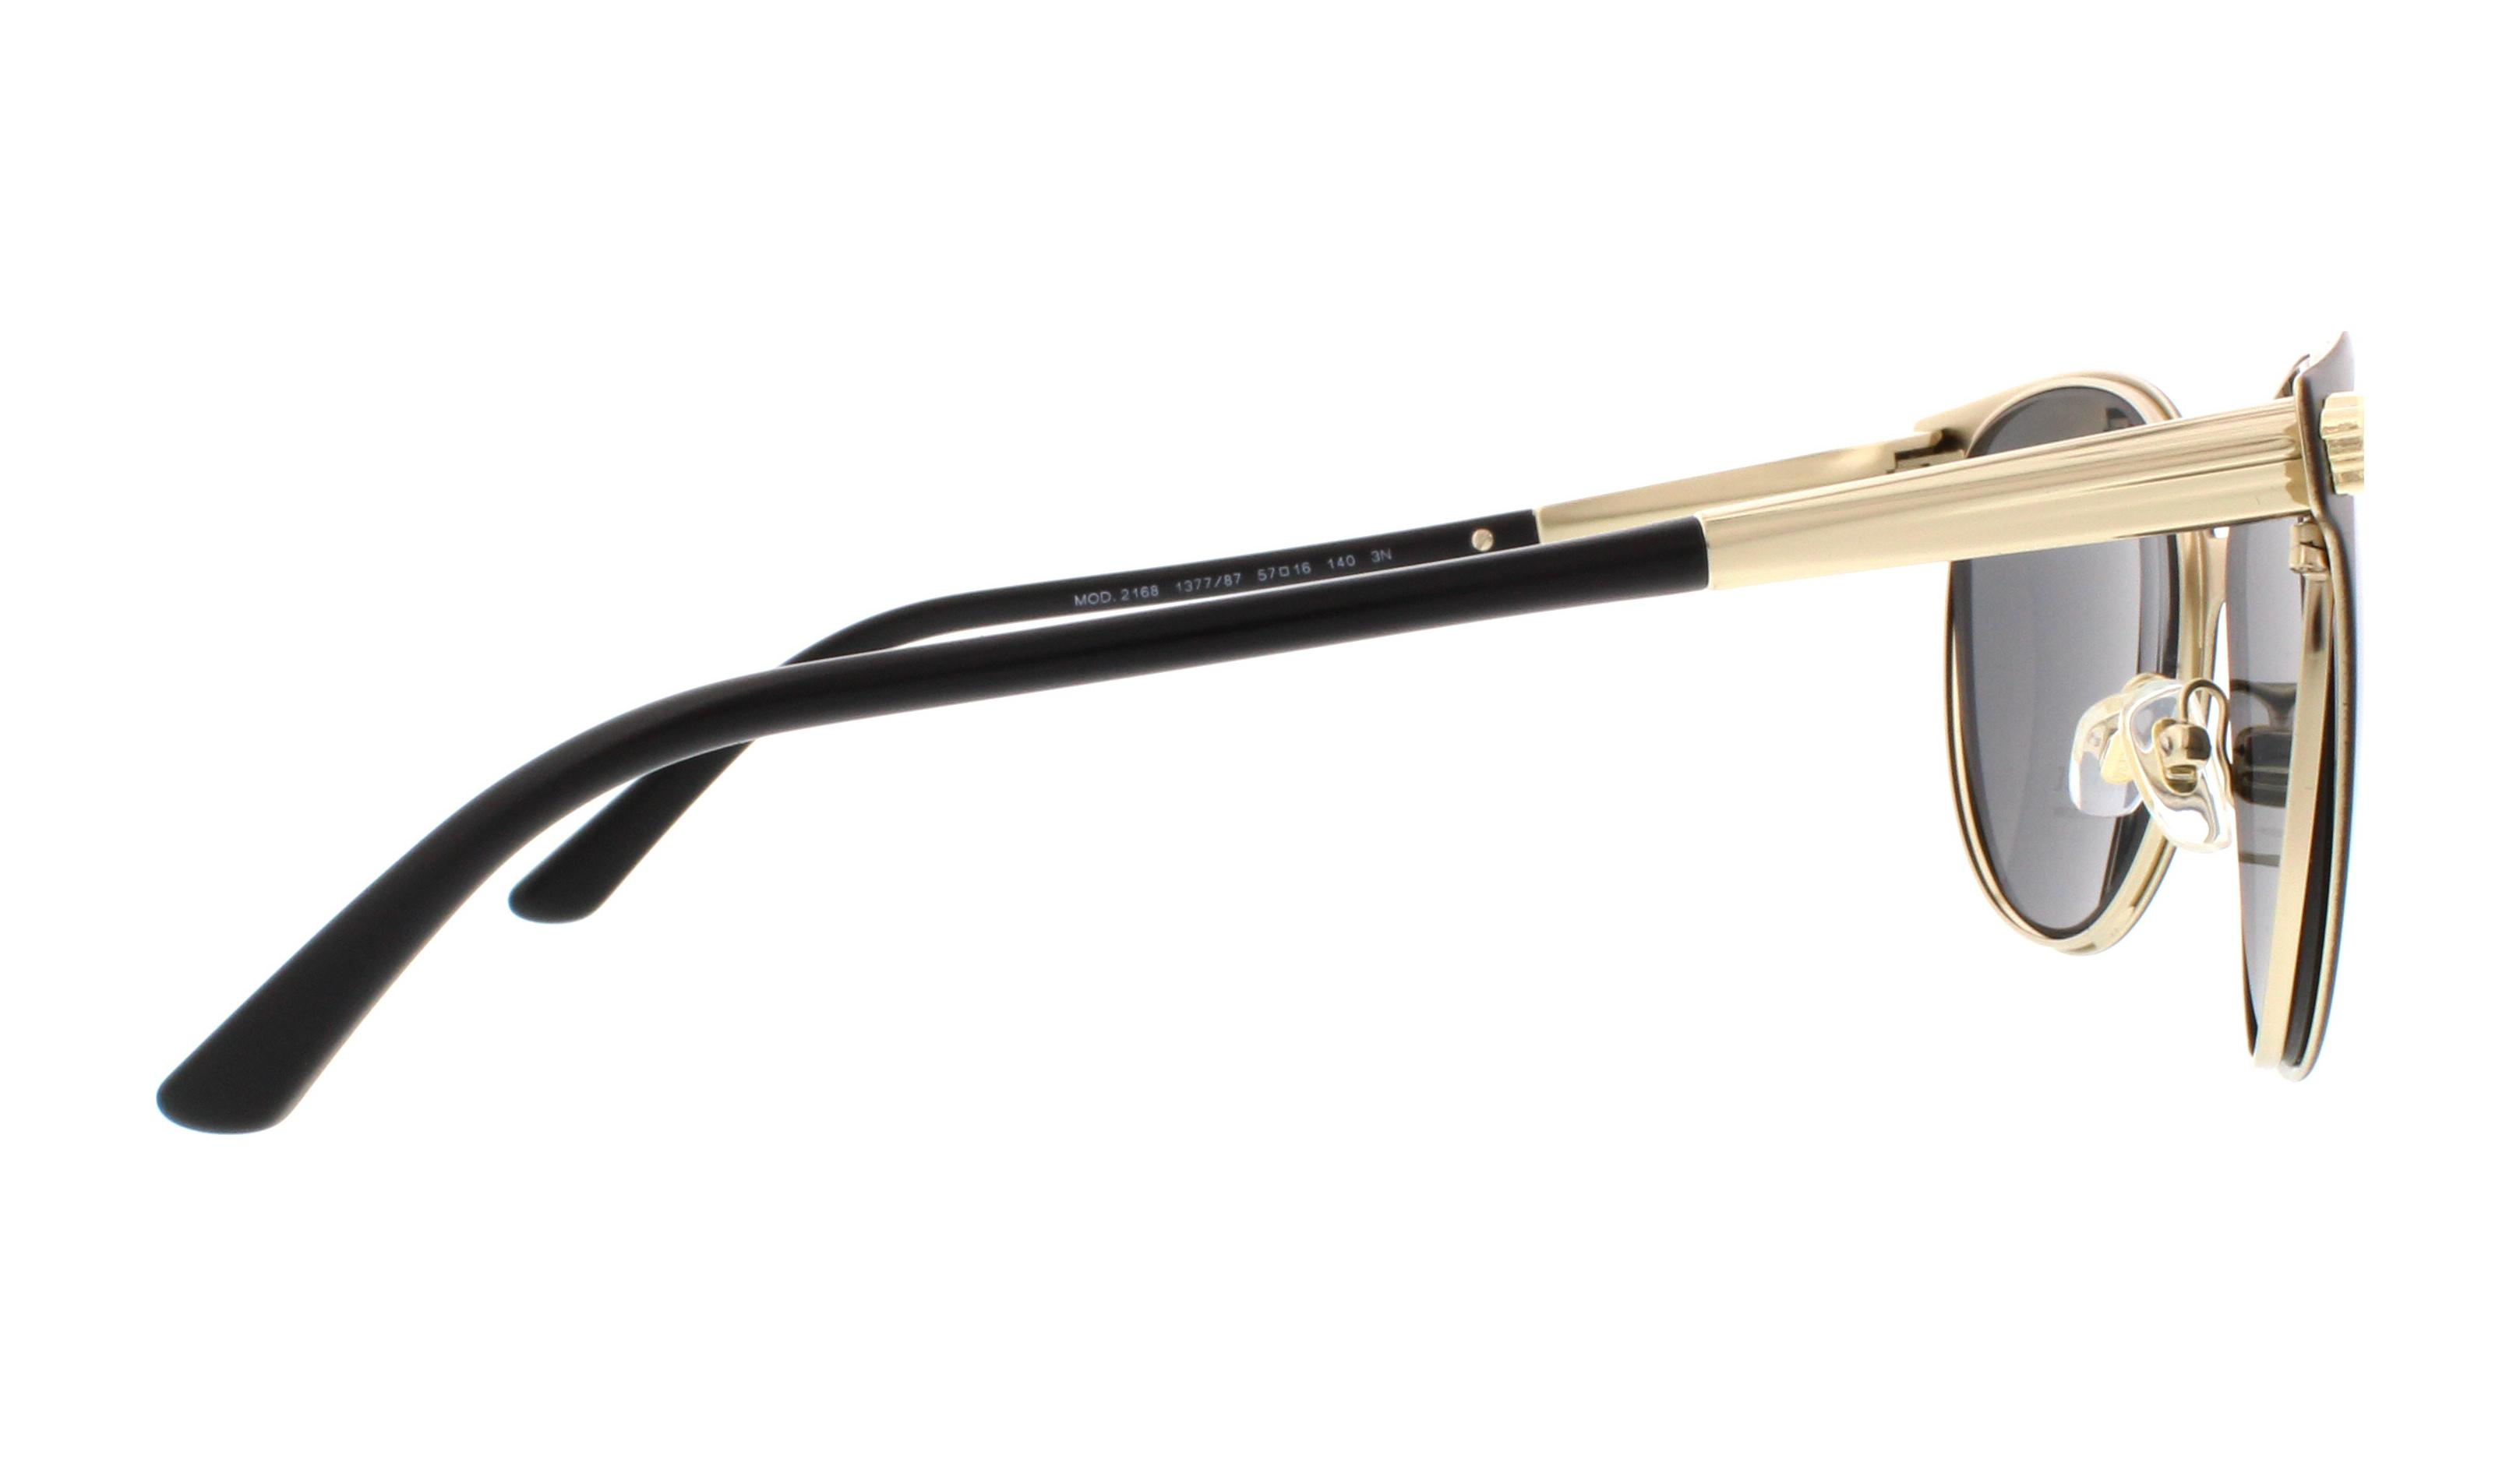 685747bb124 Versace - Versace Women s VE2168-137787-57 Black Cat Eye Sunglasses -  Walmart.com